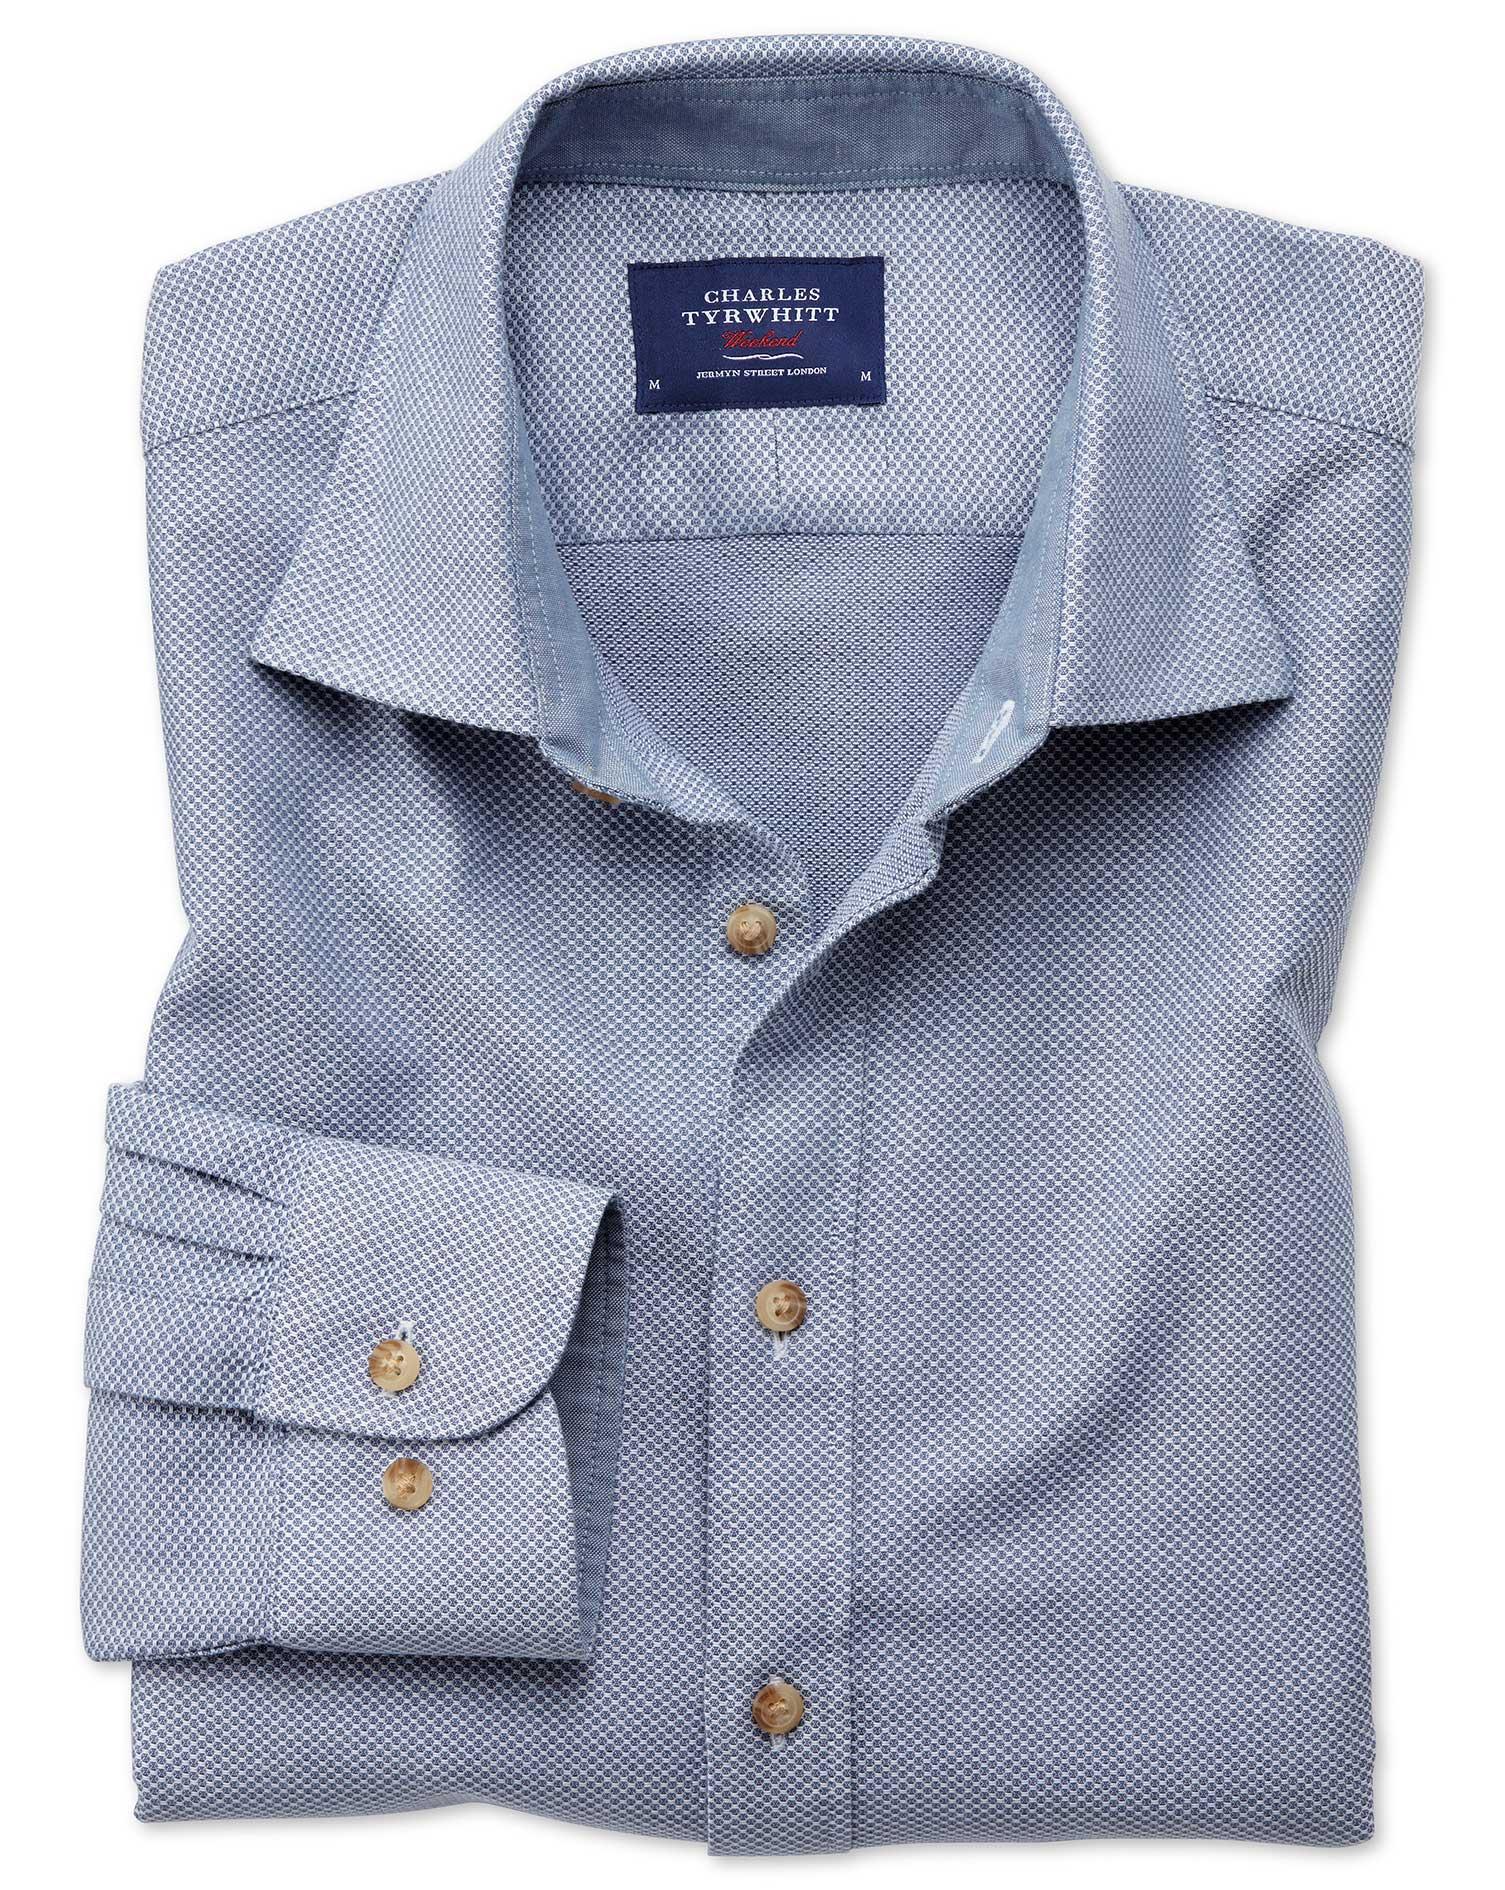 Slim Fit Washed Textured Denim Blue Cotton Shirt Single Cuff Size XS by Charles Tyrwhitt